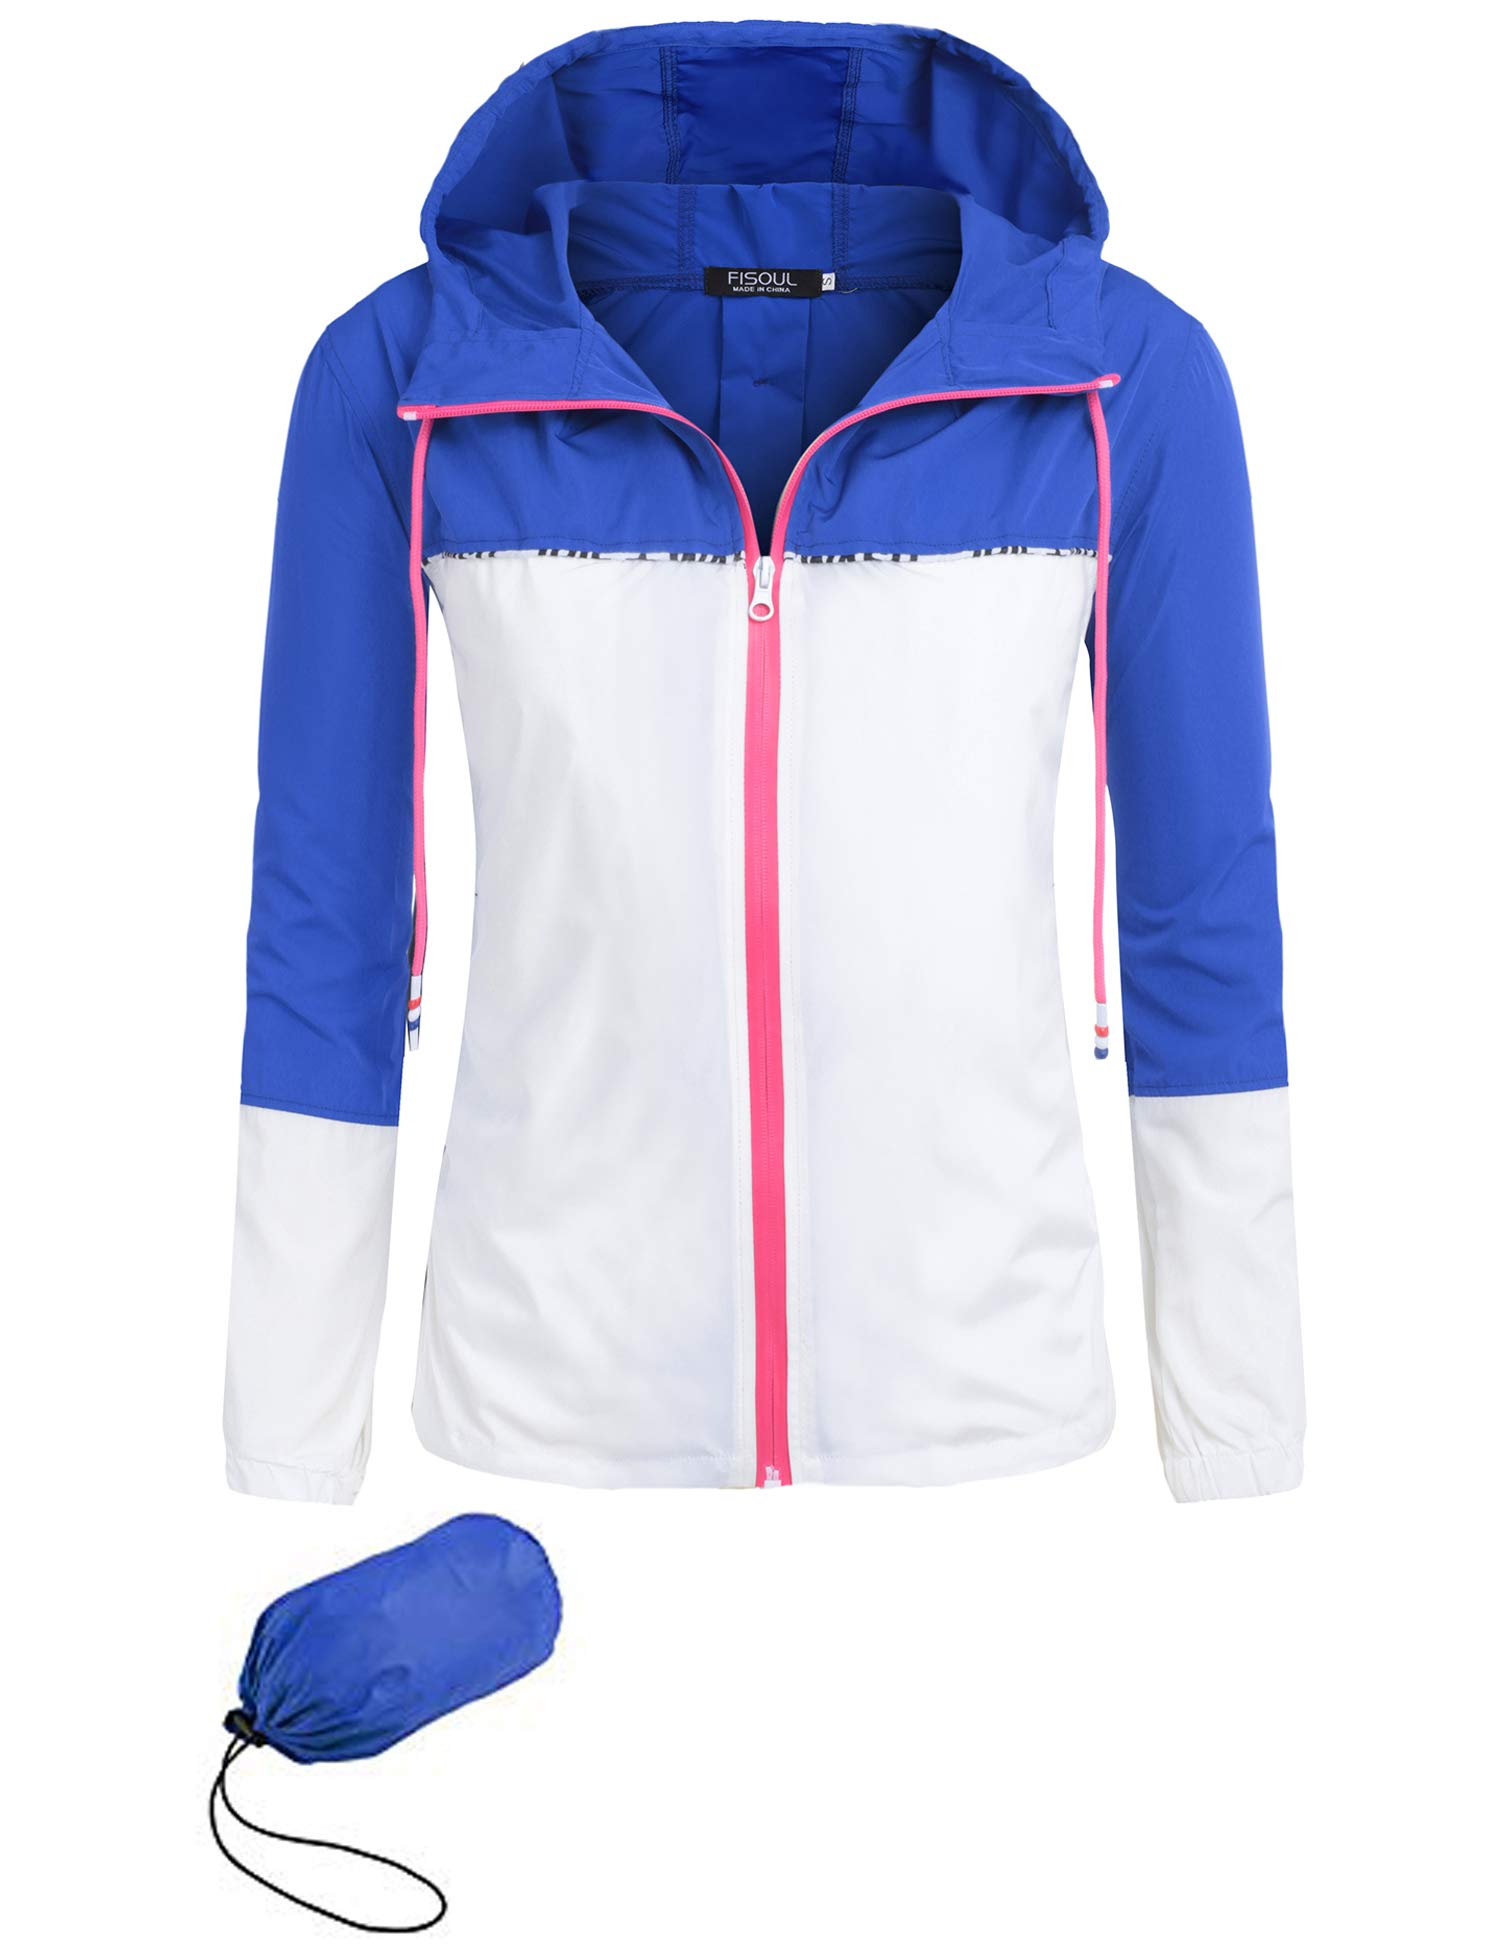 b2b22cd33 Galleon - FISOUL Women's Waterproof Raincoat Active Outdoor Hooded Rain  Jacket Lightweight Windbreaker S-XXL(Blue/White,Medium)